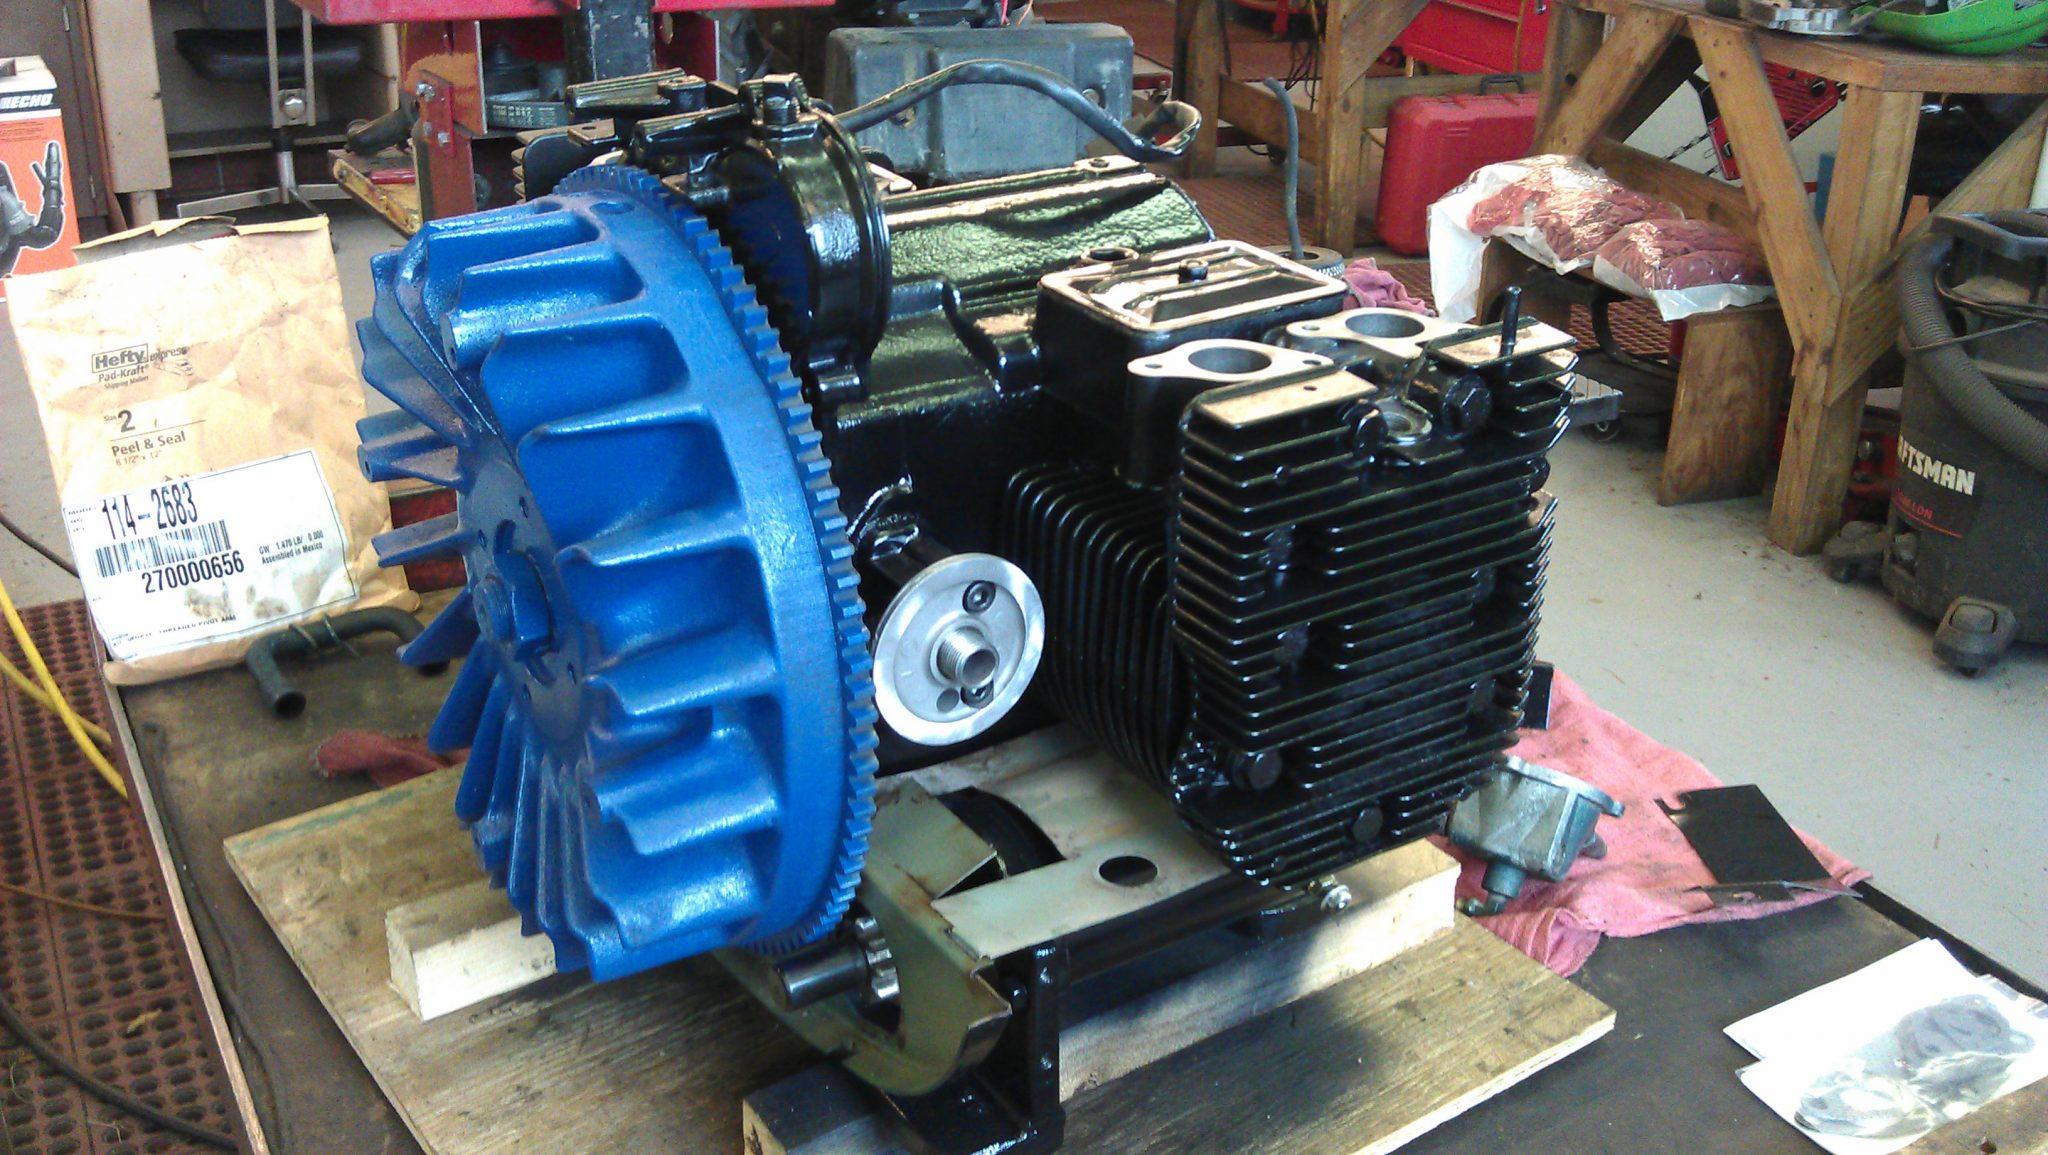 Kohler K582 Full Engine Rebuild Out of a Scale Calibration Machine